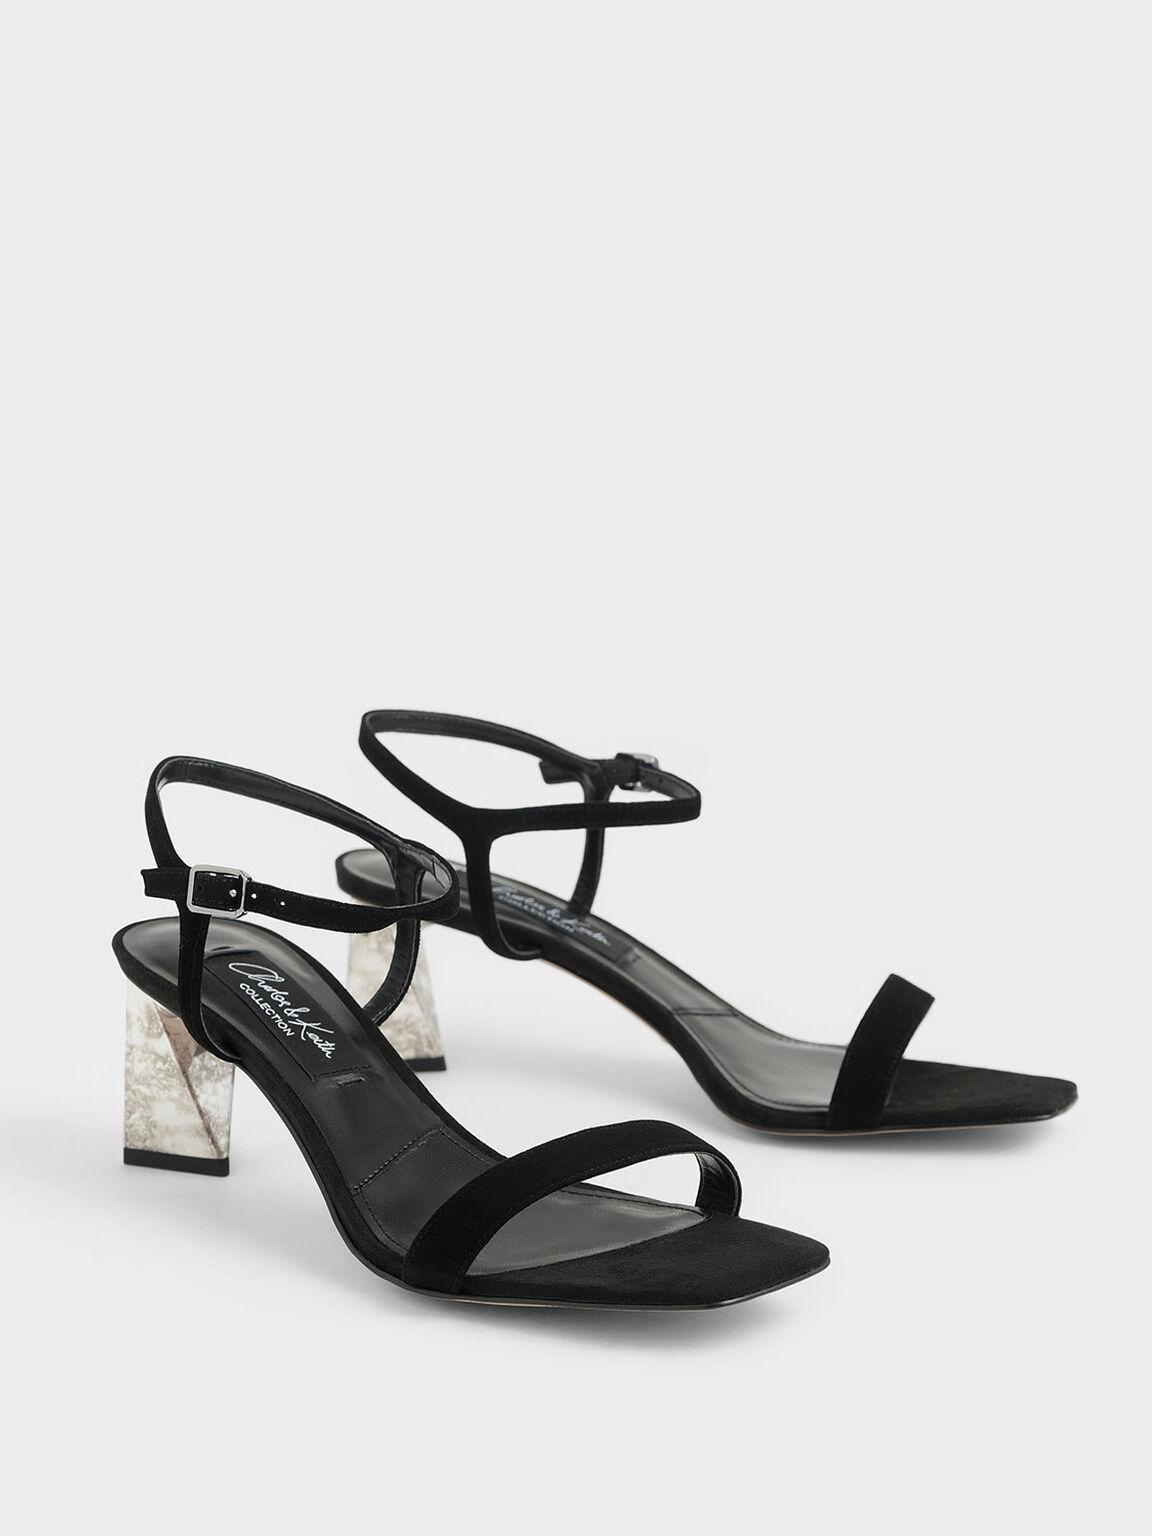 Chrome Heel Sandals (Kid Suede), Black, hi-res